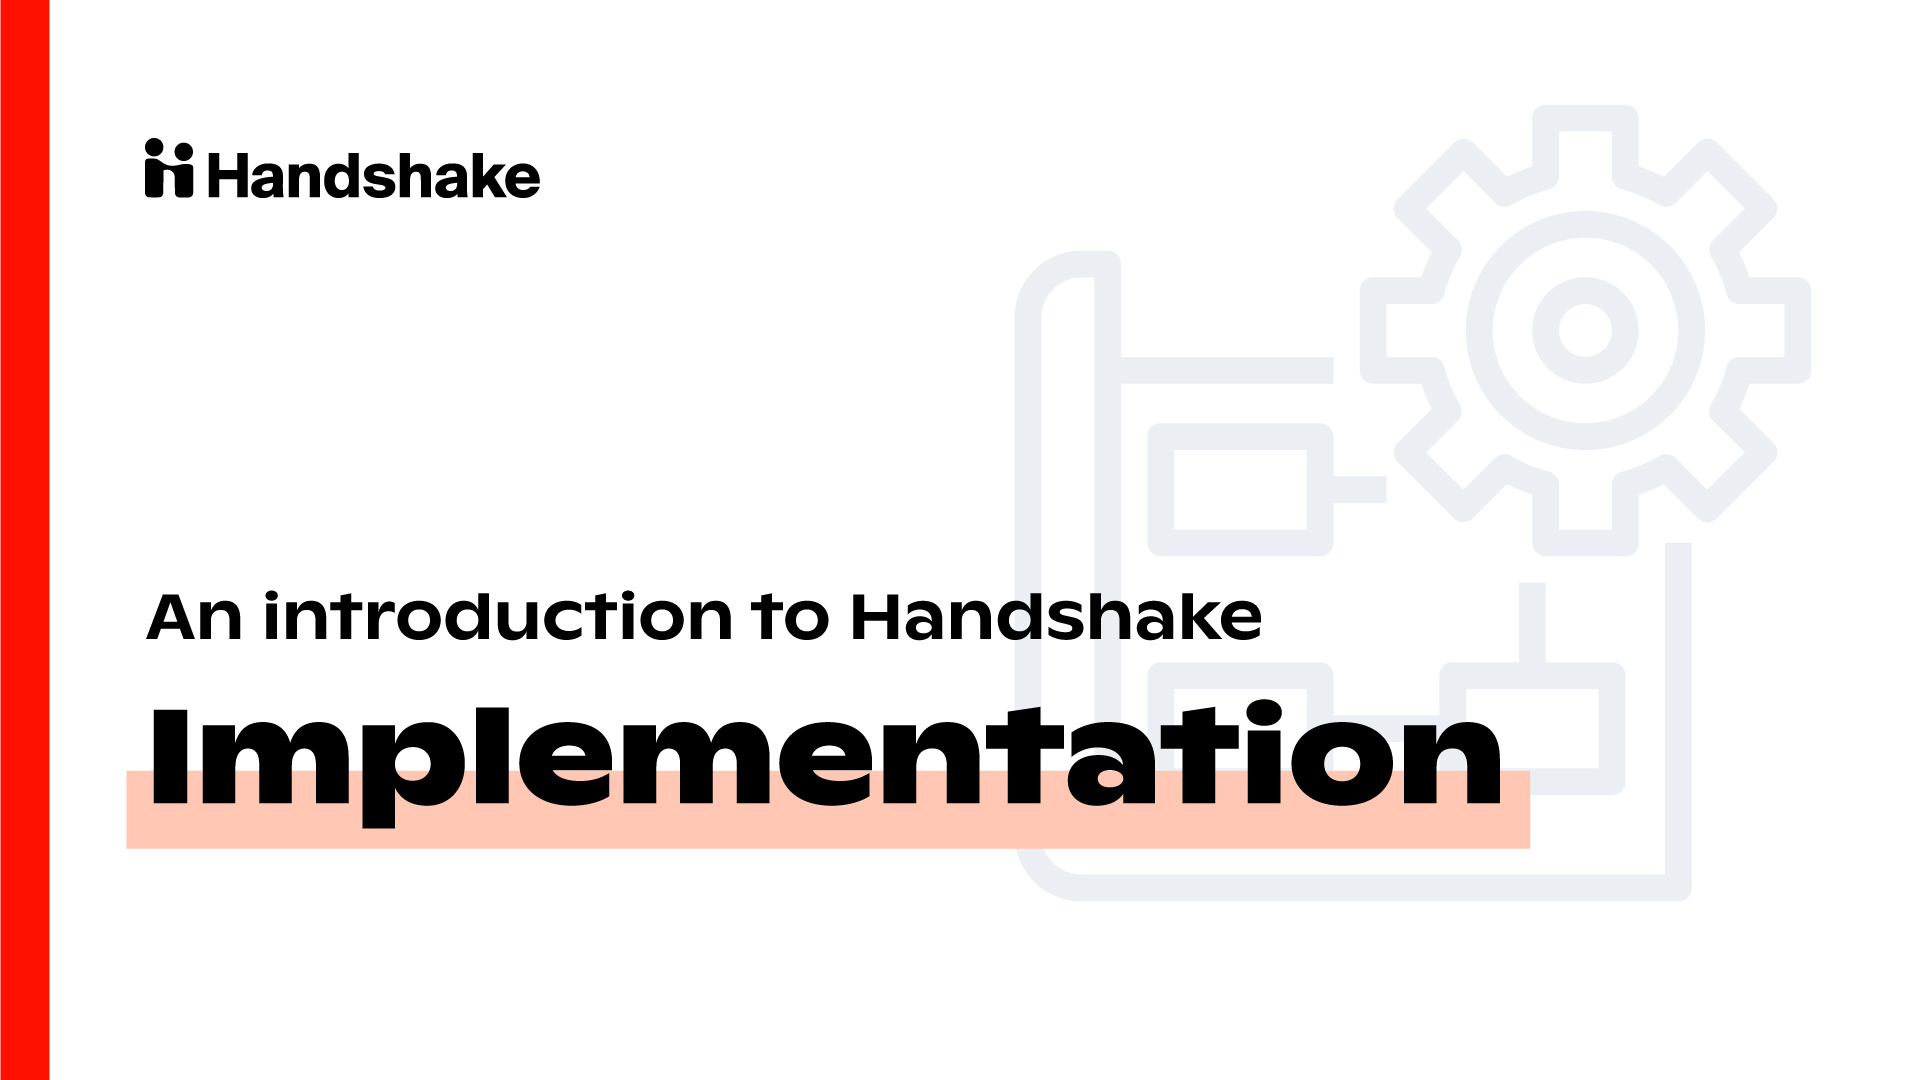 Implementation - Introduction